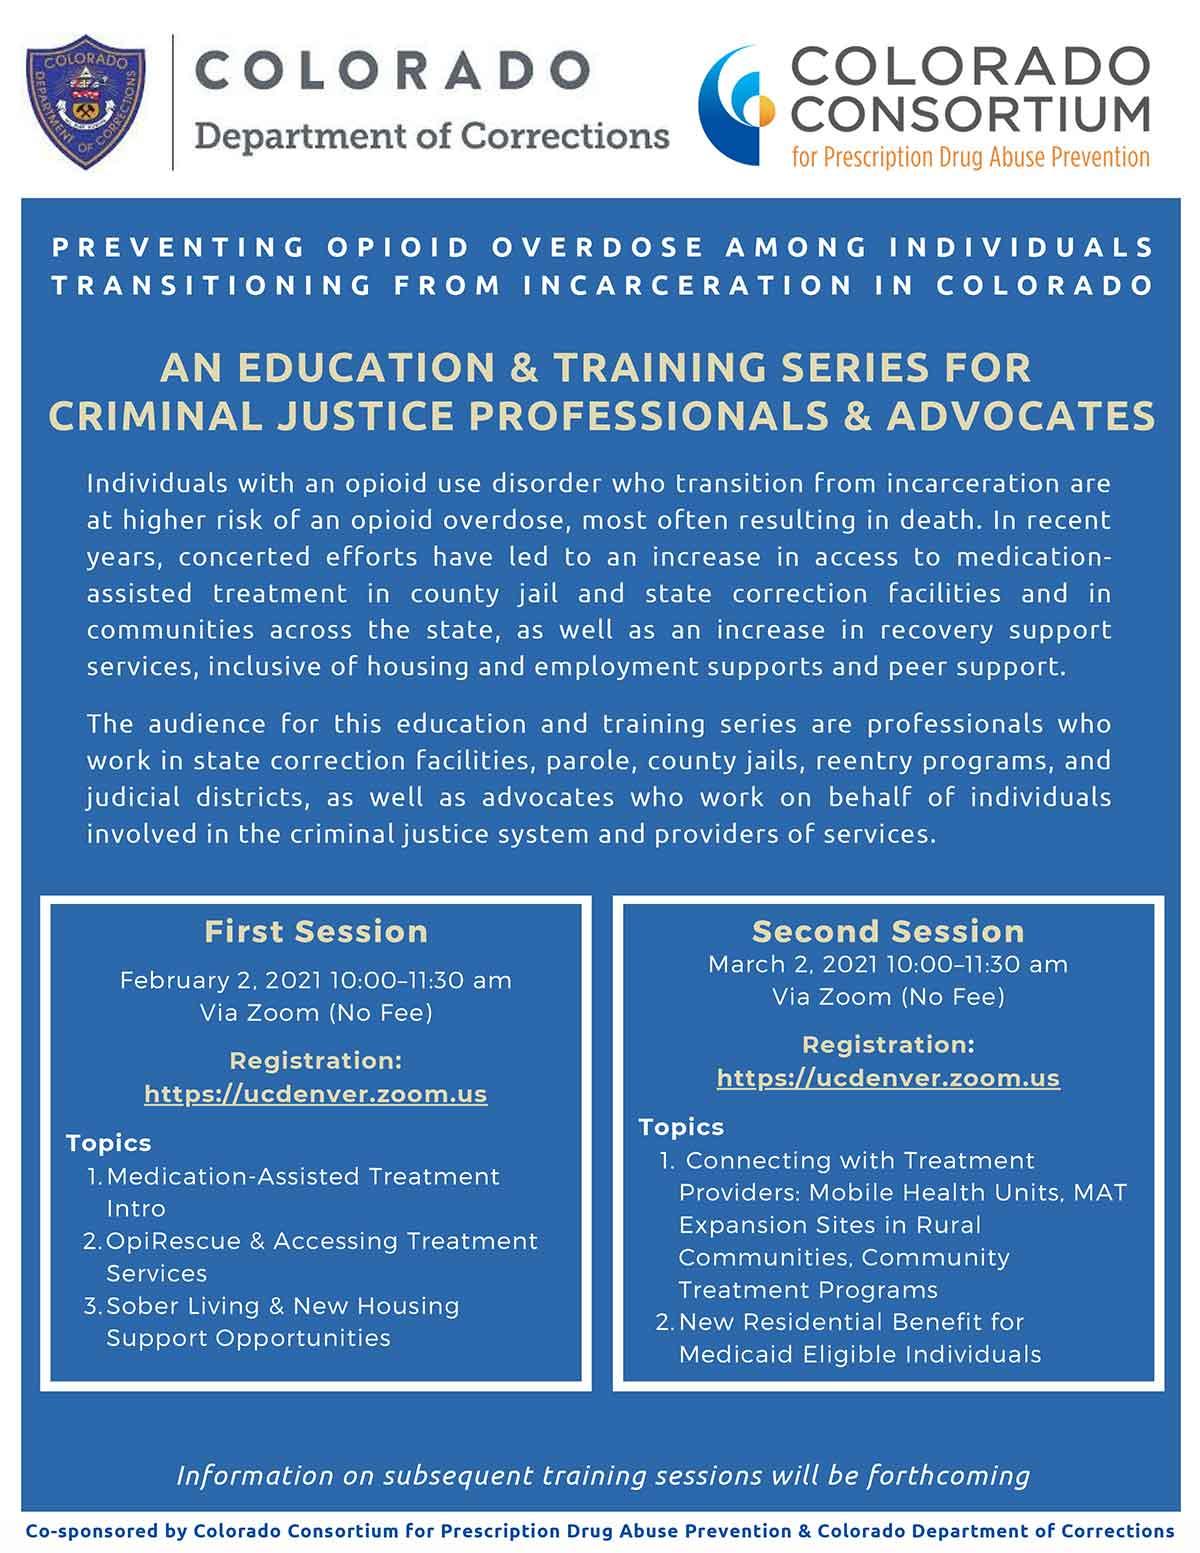 Criminal-Justice-Training-Flyer-Feb-Mar-2021